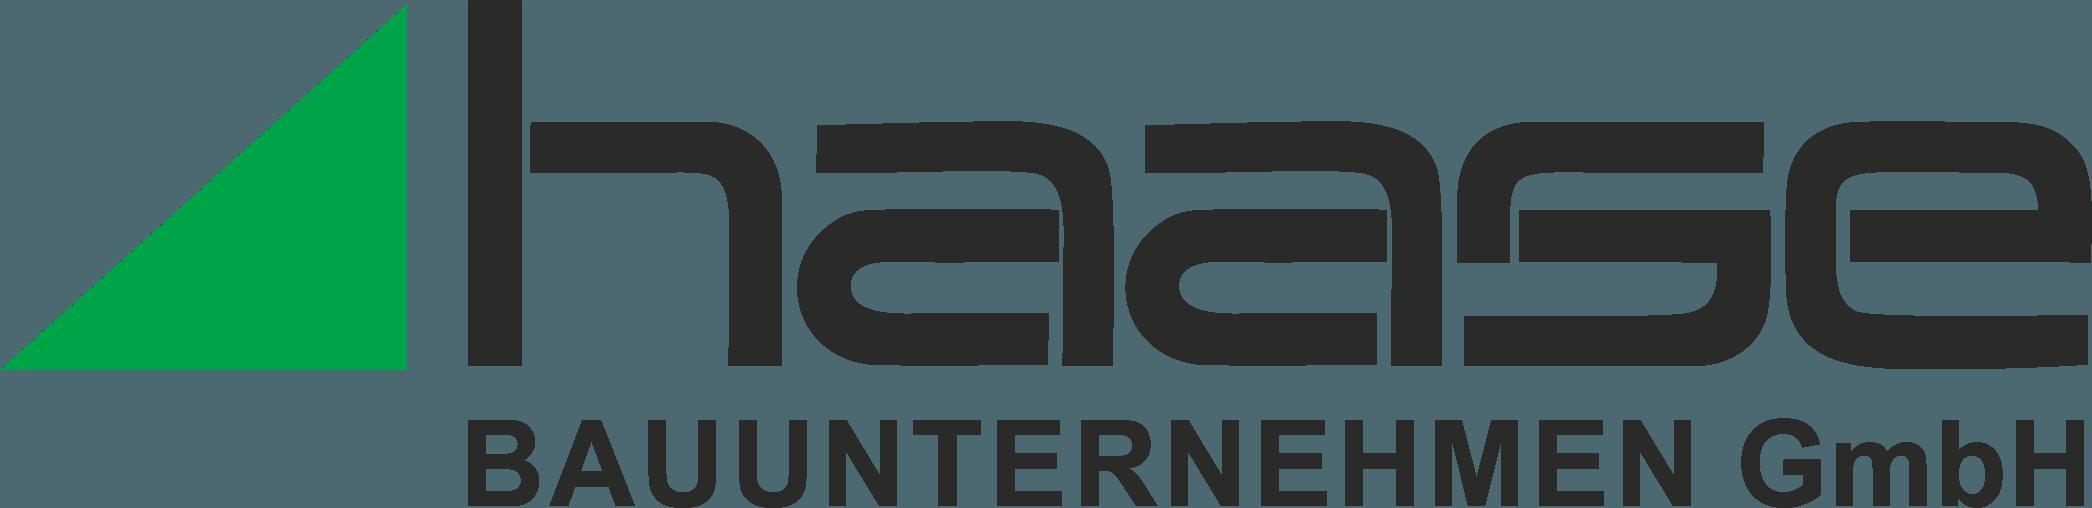 Haase Bauunternehmen GmbH